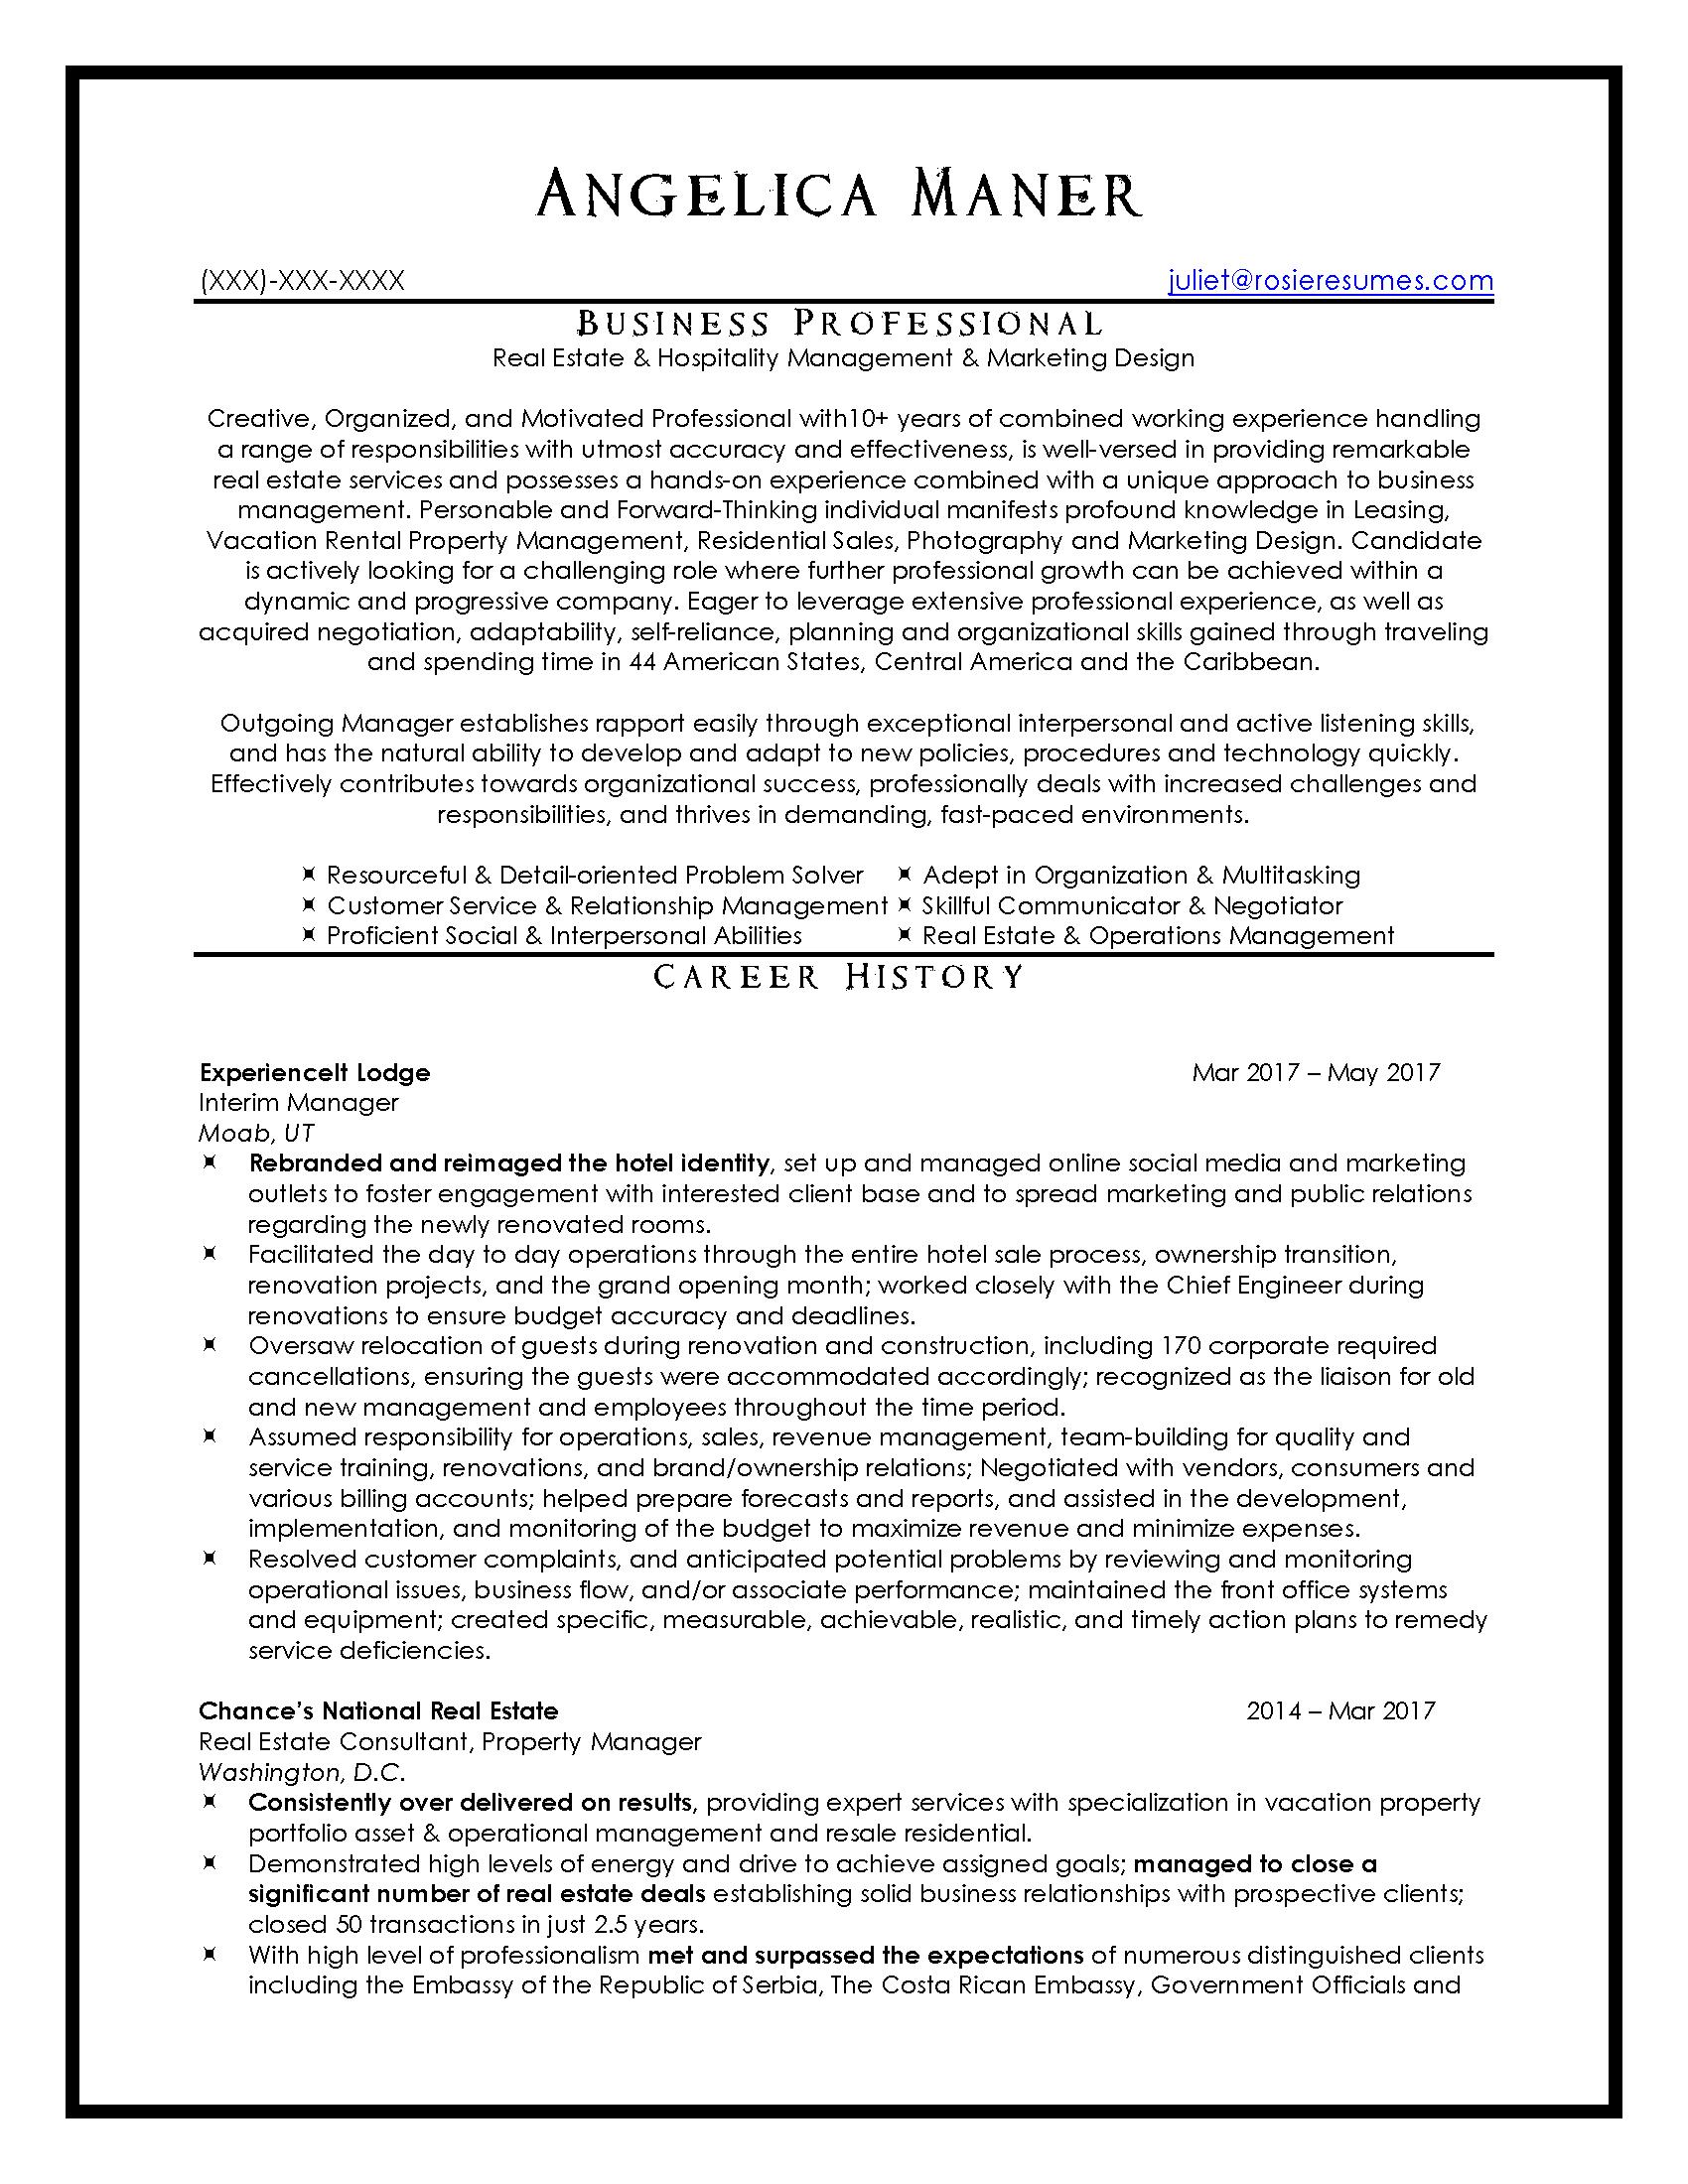 RRTRS Hospitality Resume Sample_Page_1